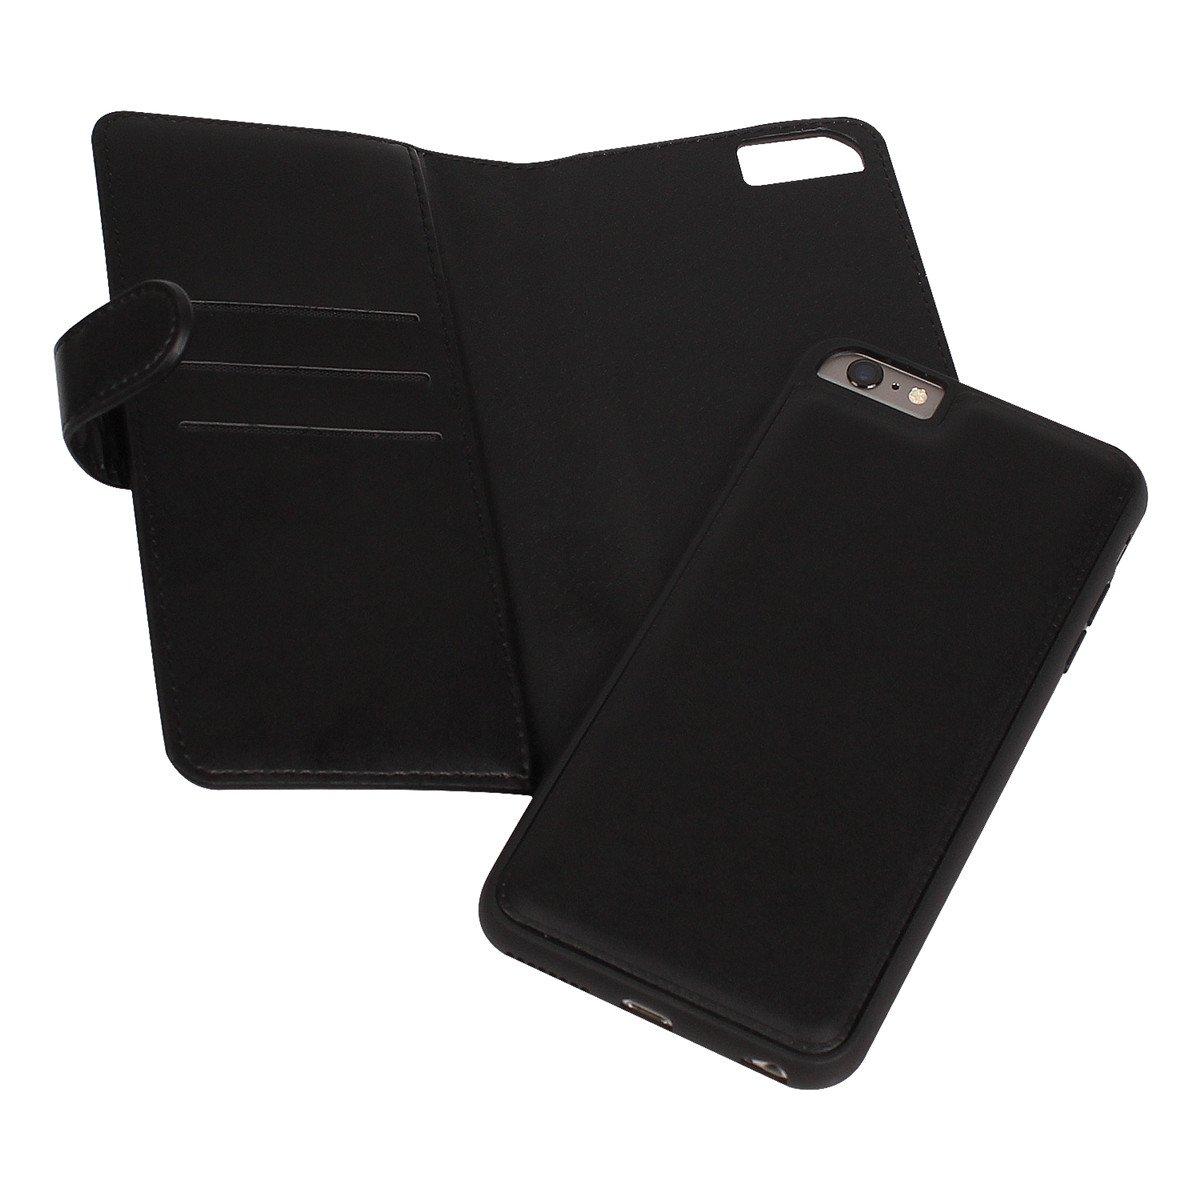 "alt""iPhoneの財布型ケースの写真"""